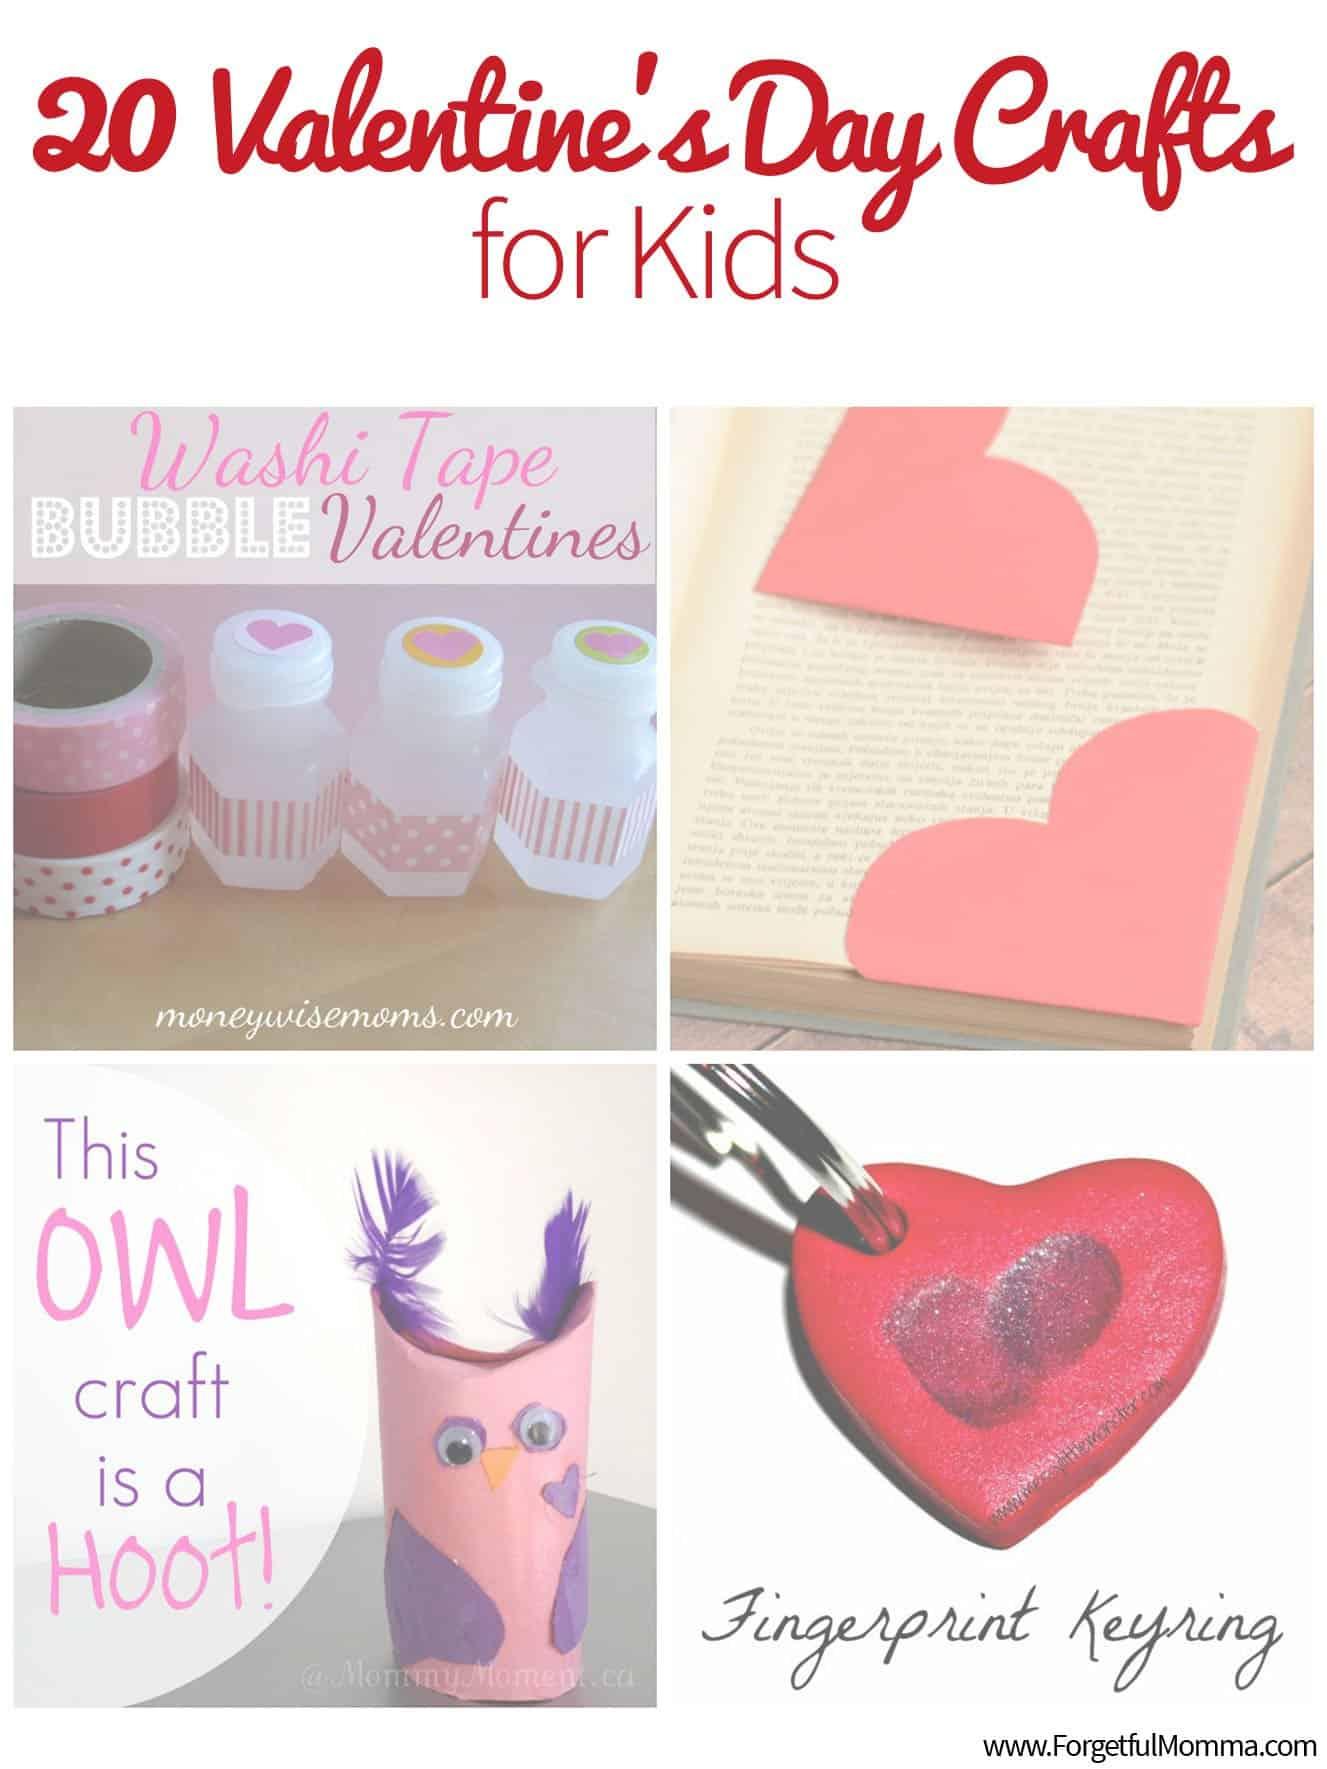 20 Valentine's Day Crafts for Kids